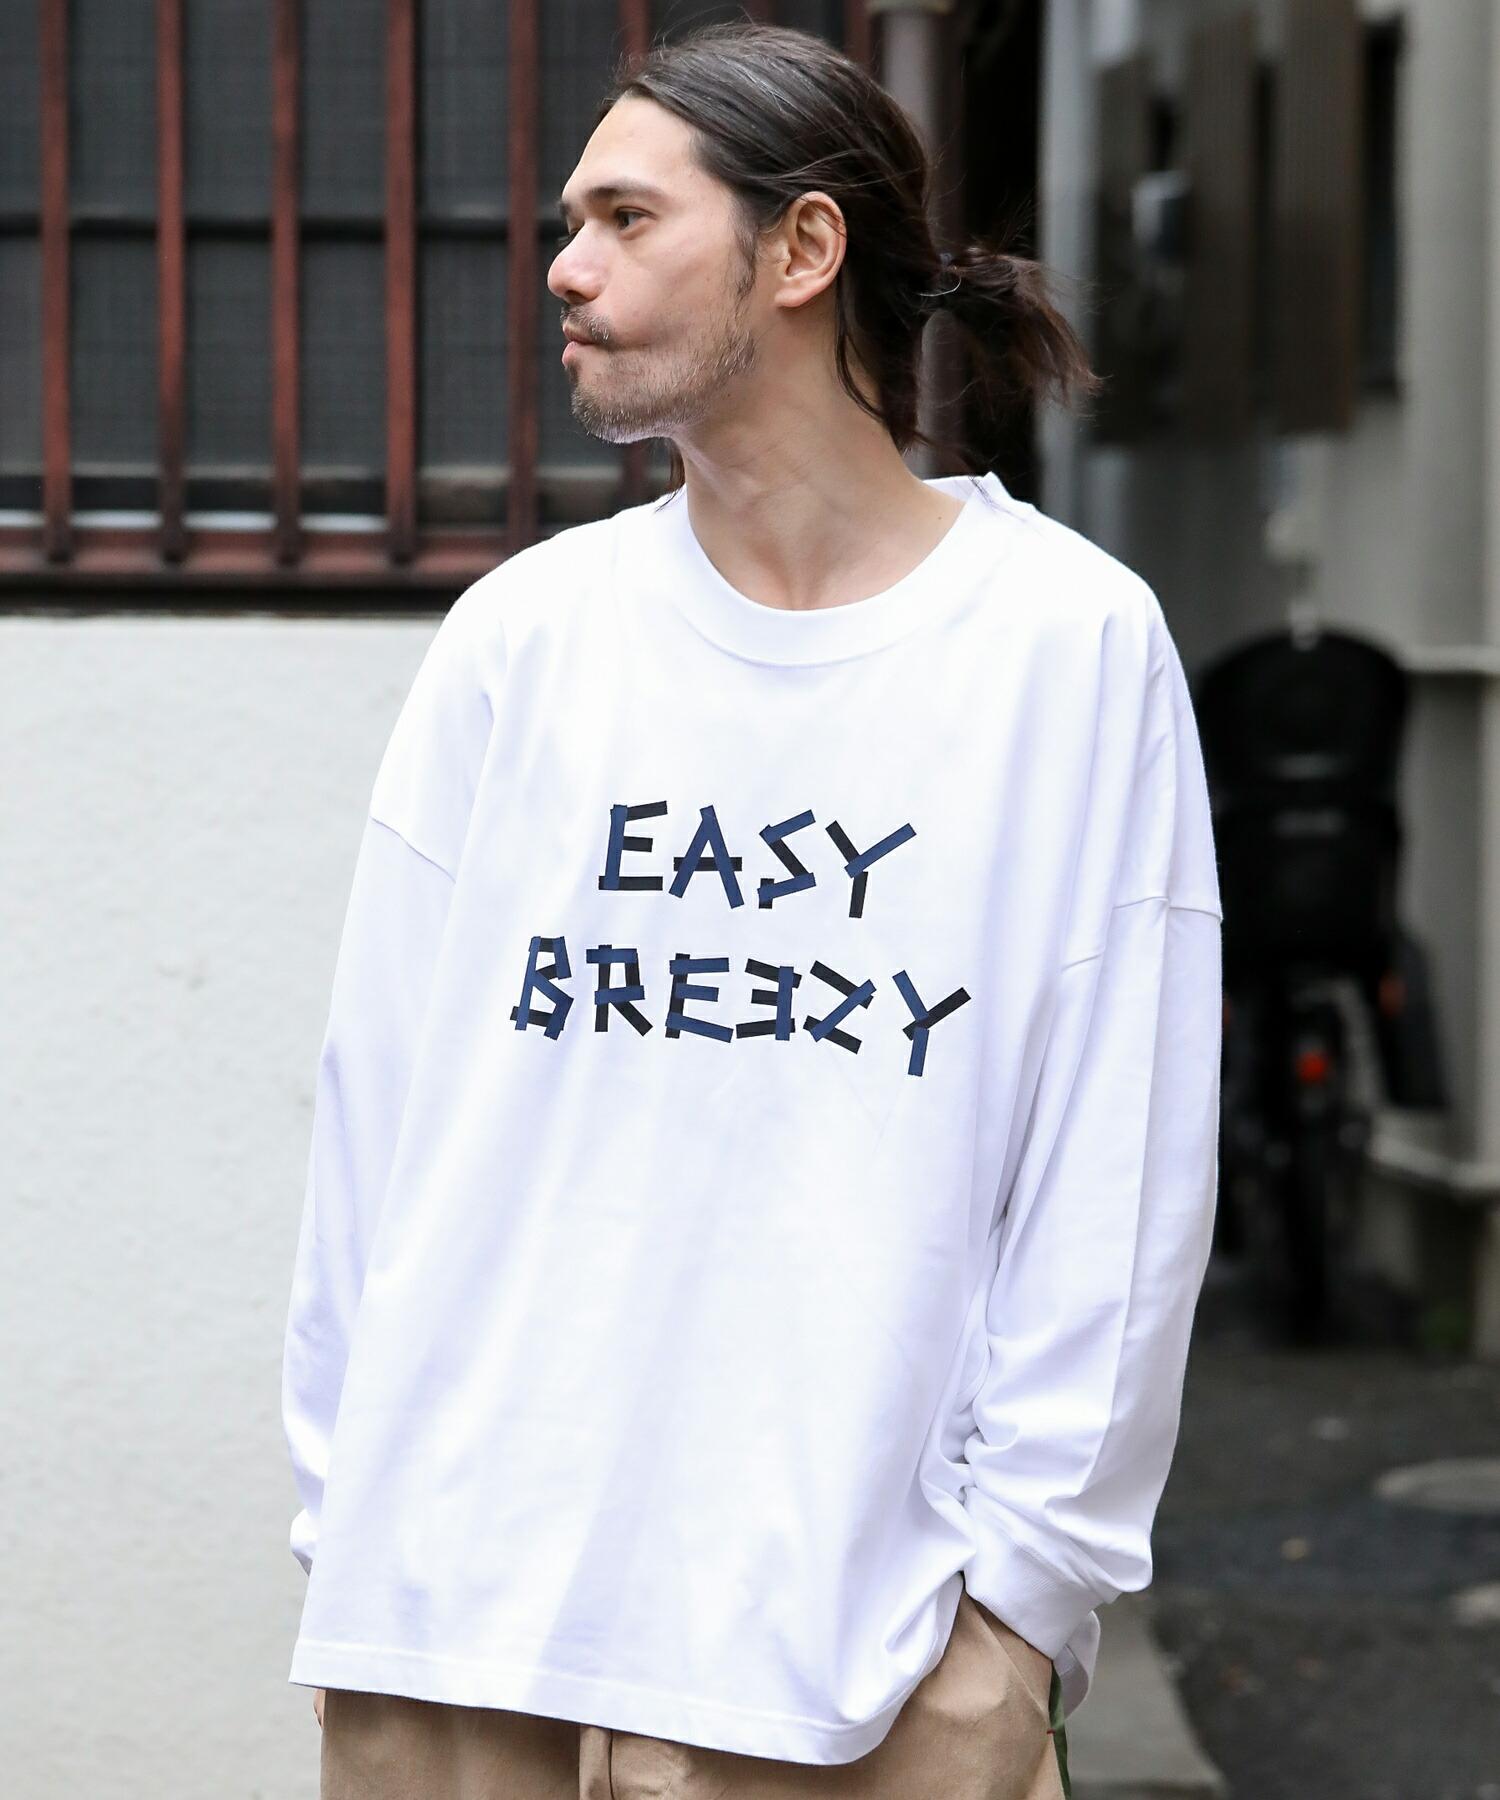 【masterkey(マスターキー)】EAZY BREEZY(MK21A-C-31)